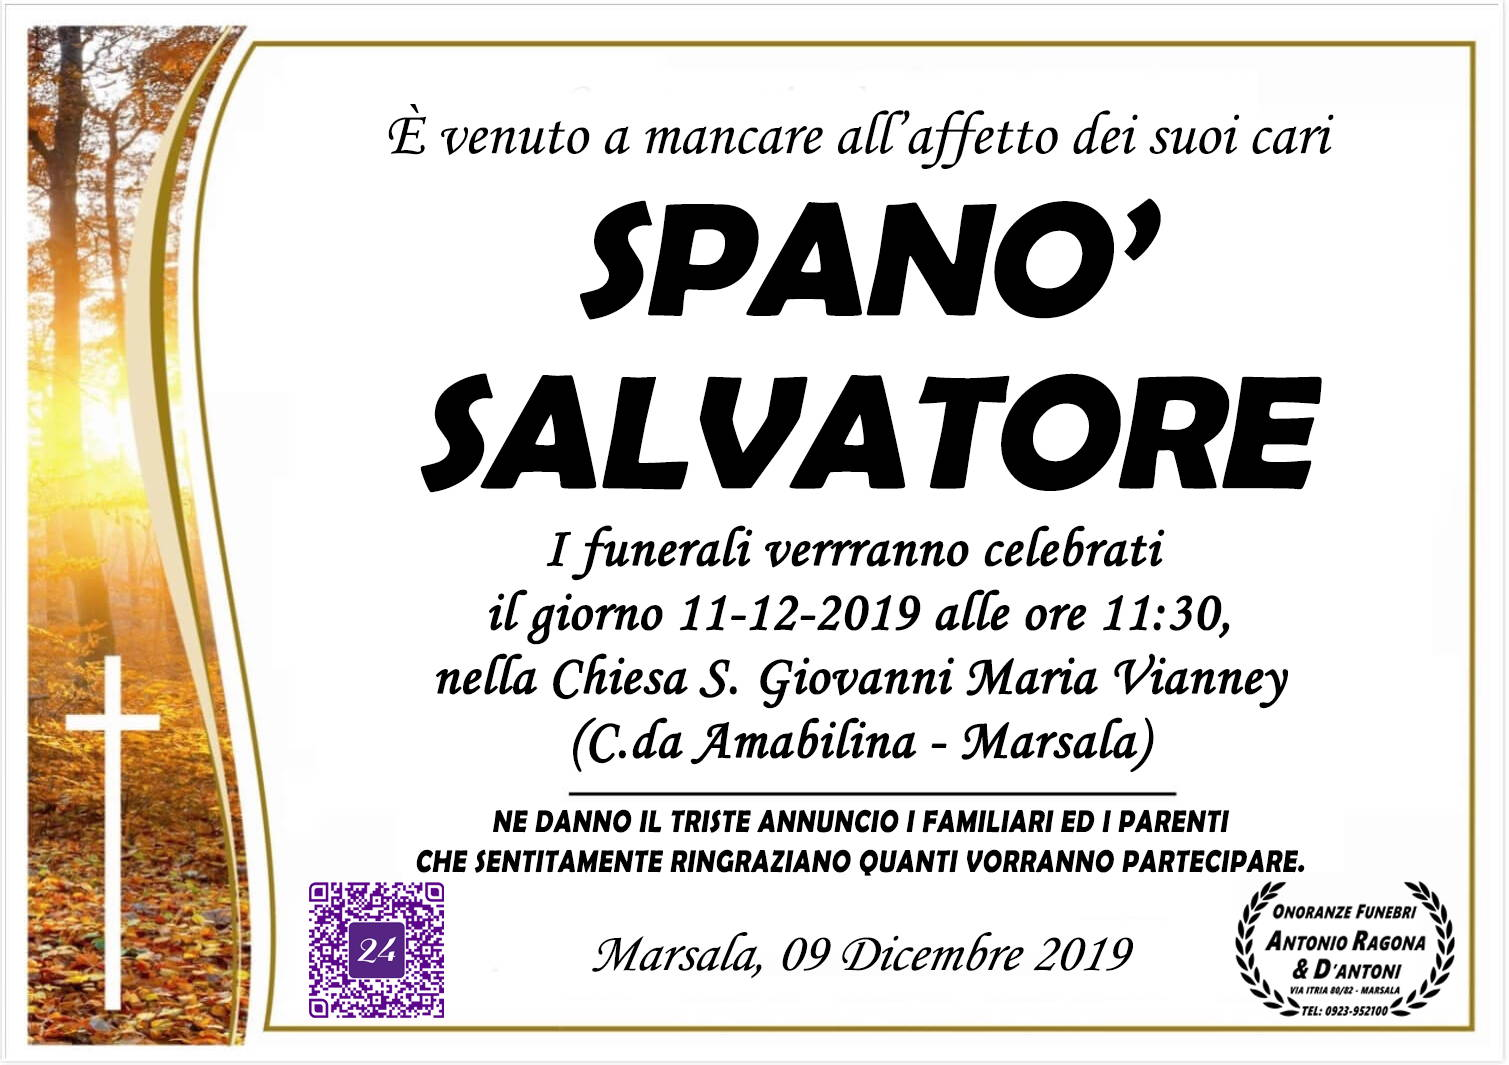 Salvatore Spanò